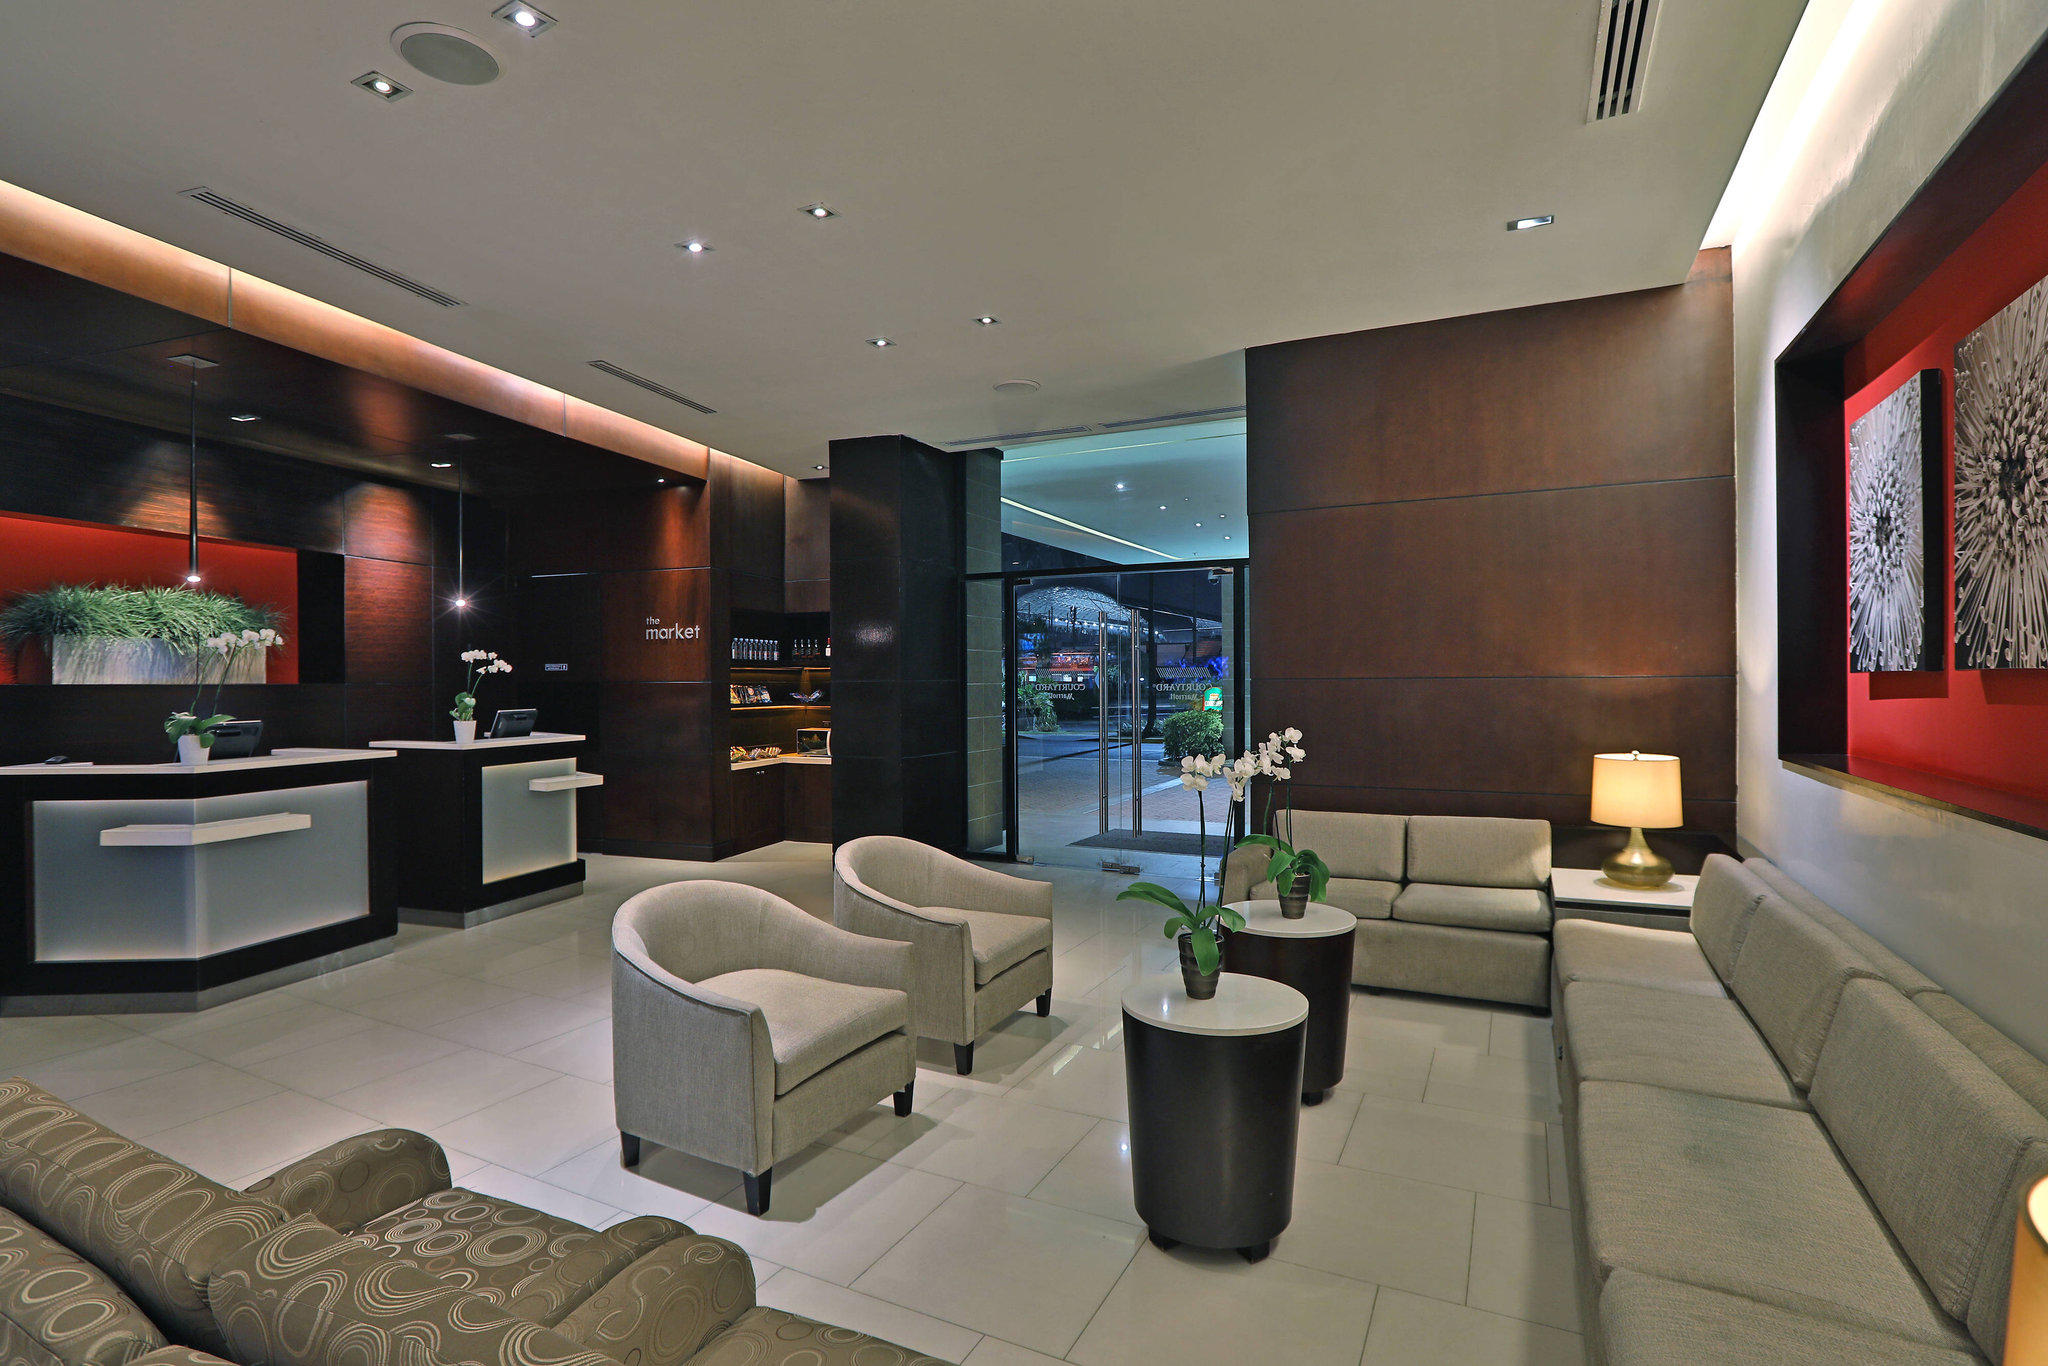 Courtyard by Marriott Panama Metromall